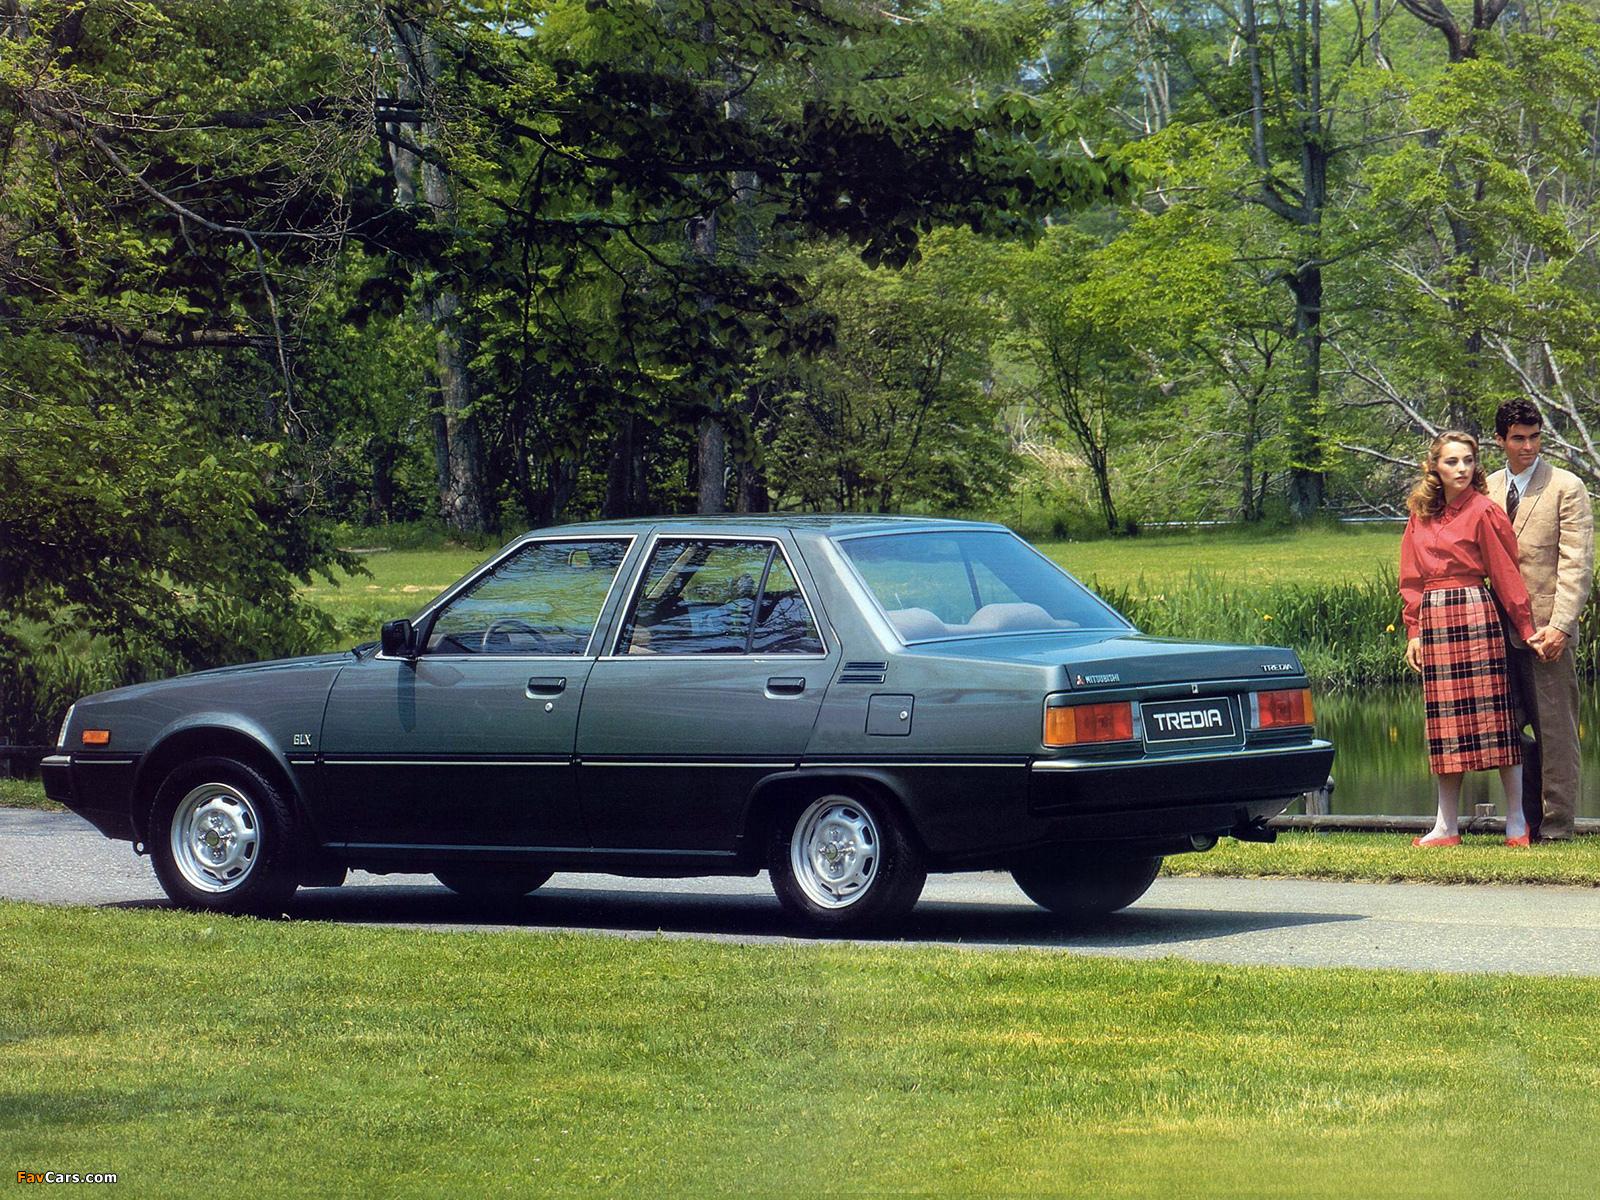 Mitsubishi Tredia 1982–90 images (1600x1200)